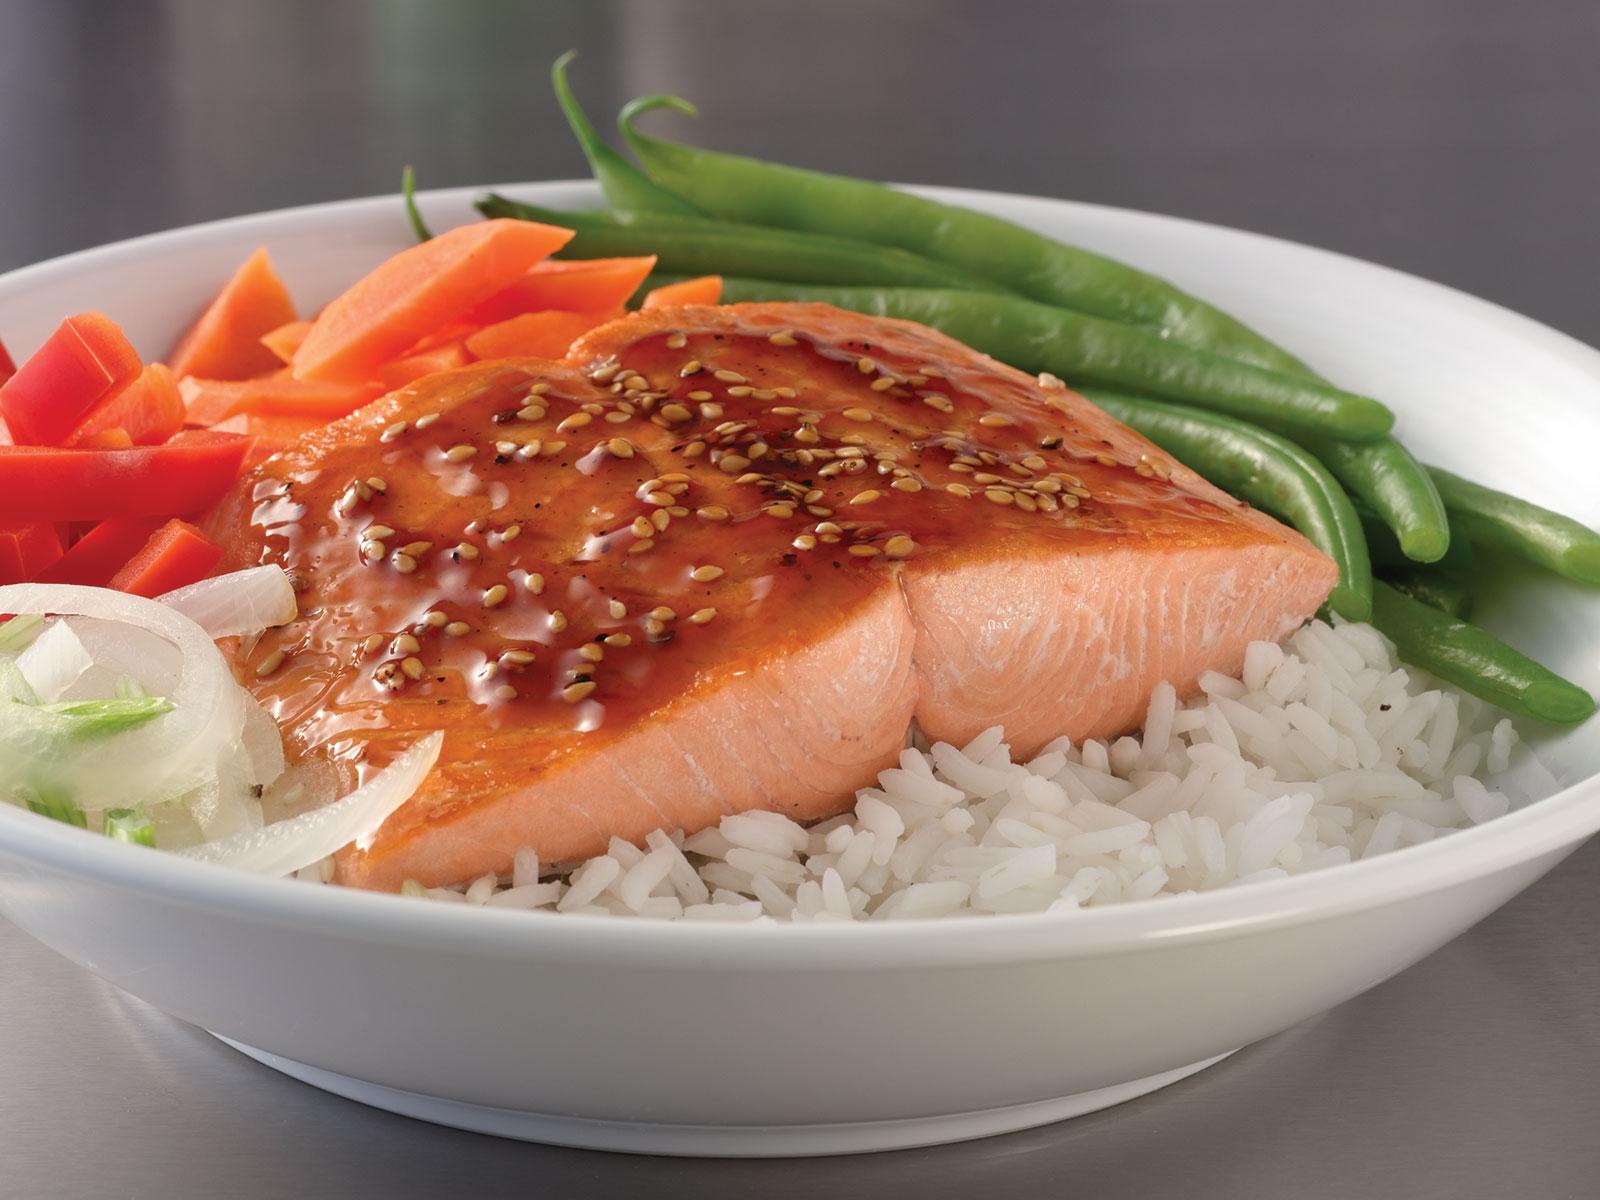 Coho Salmon Portions 8 oz Skinless, Pin Bone Out (1/10 lb) 475343